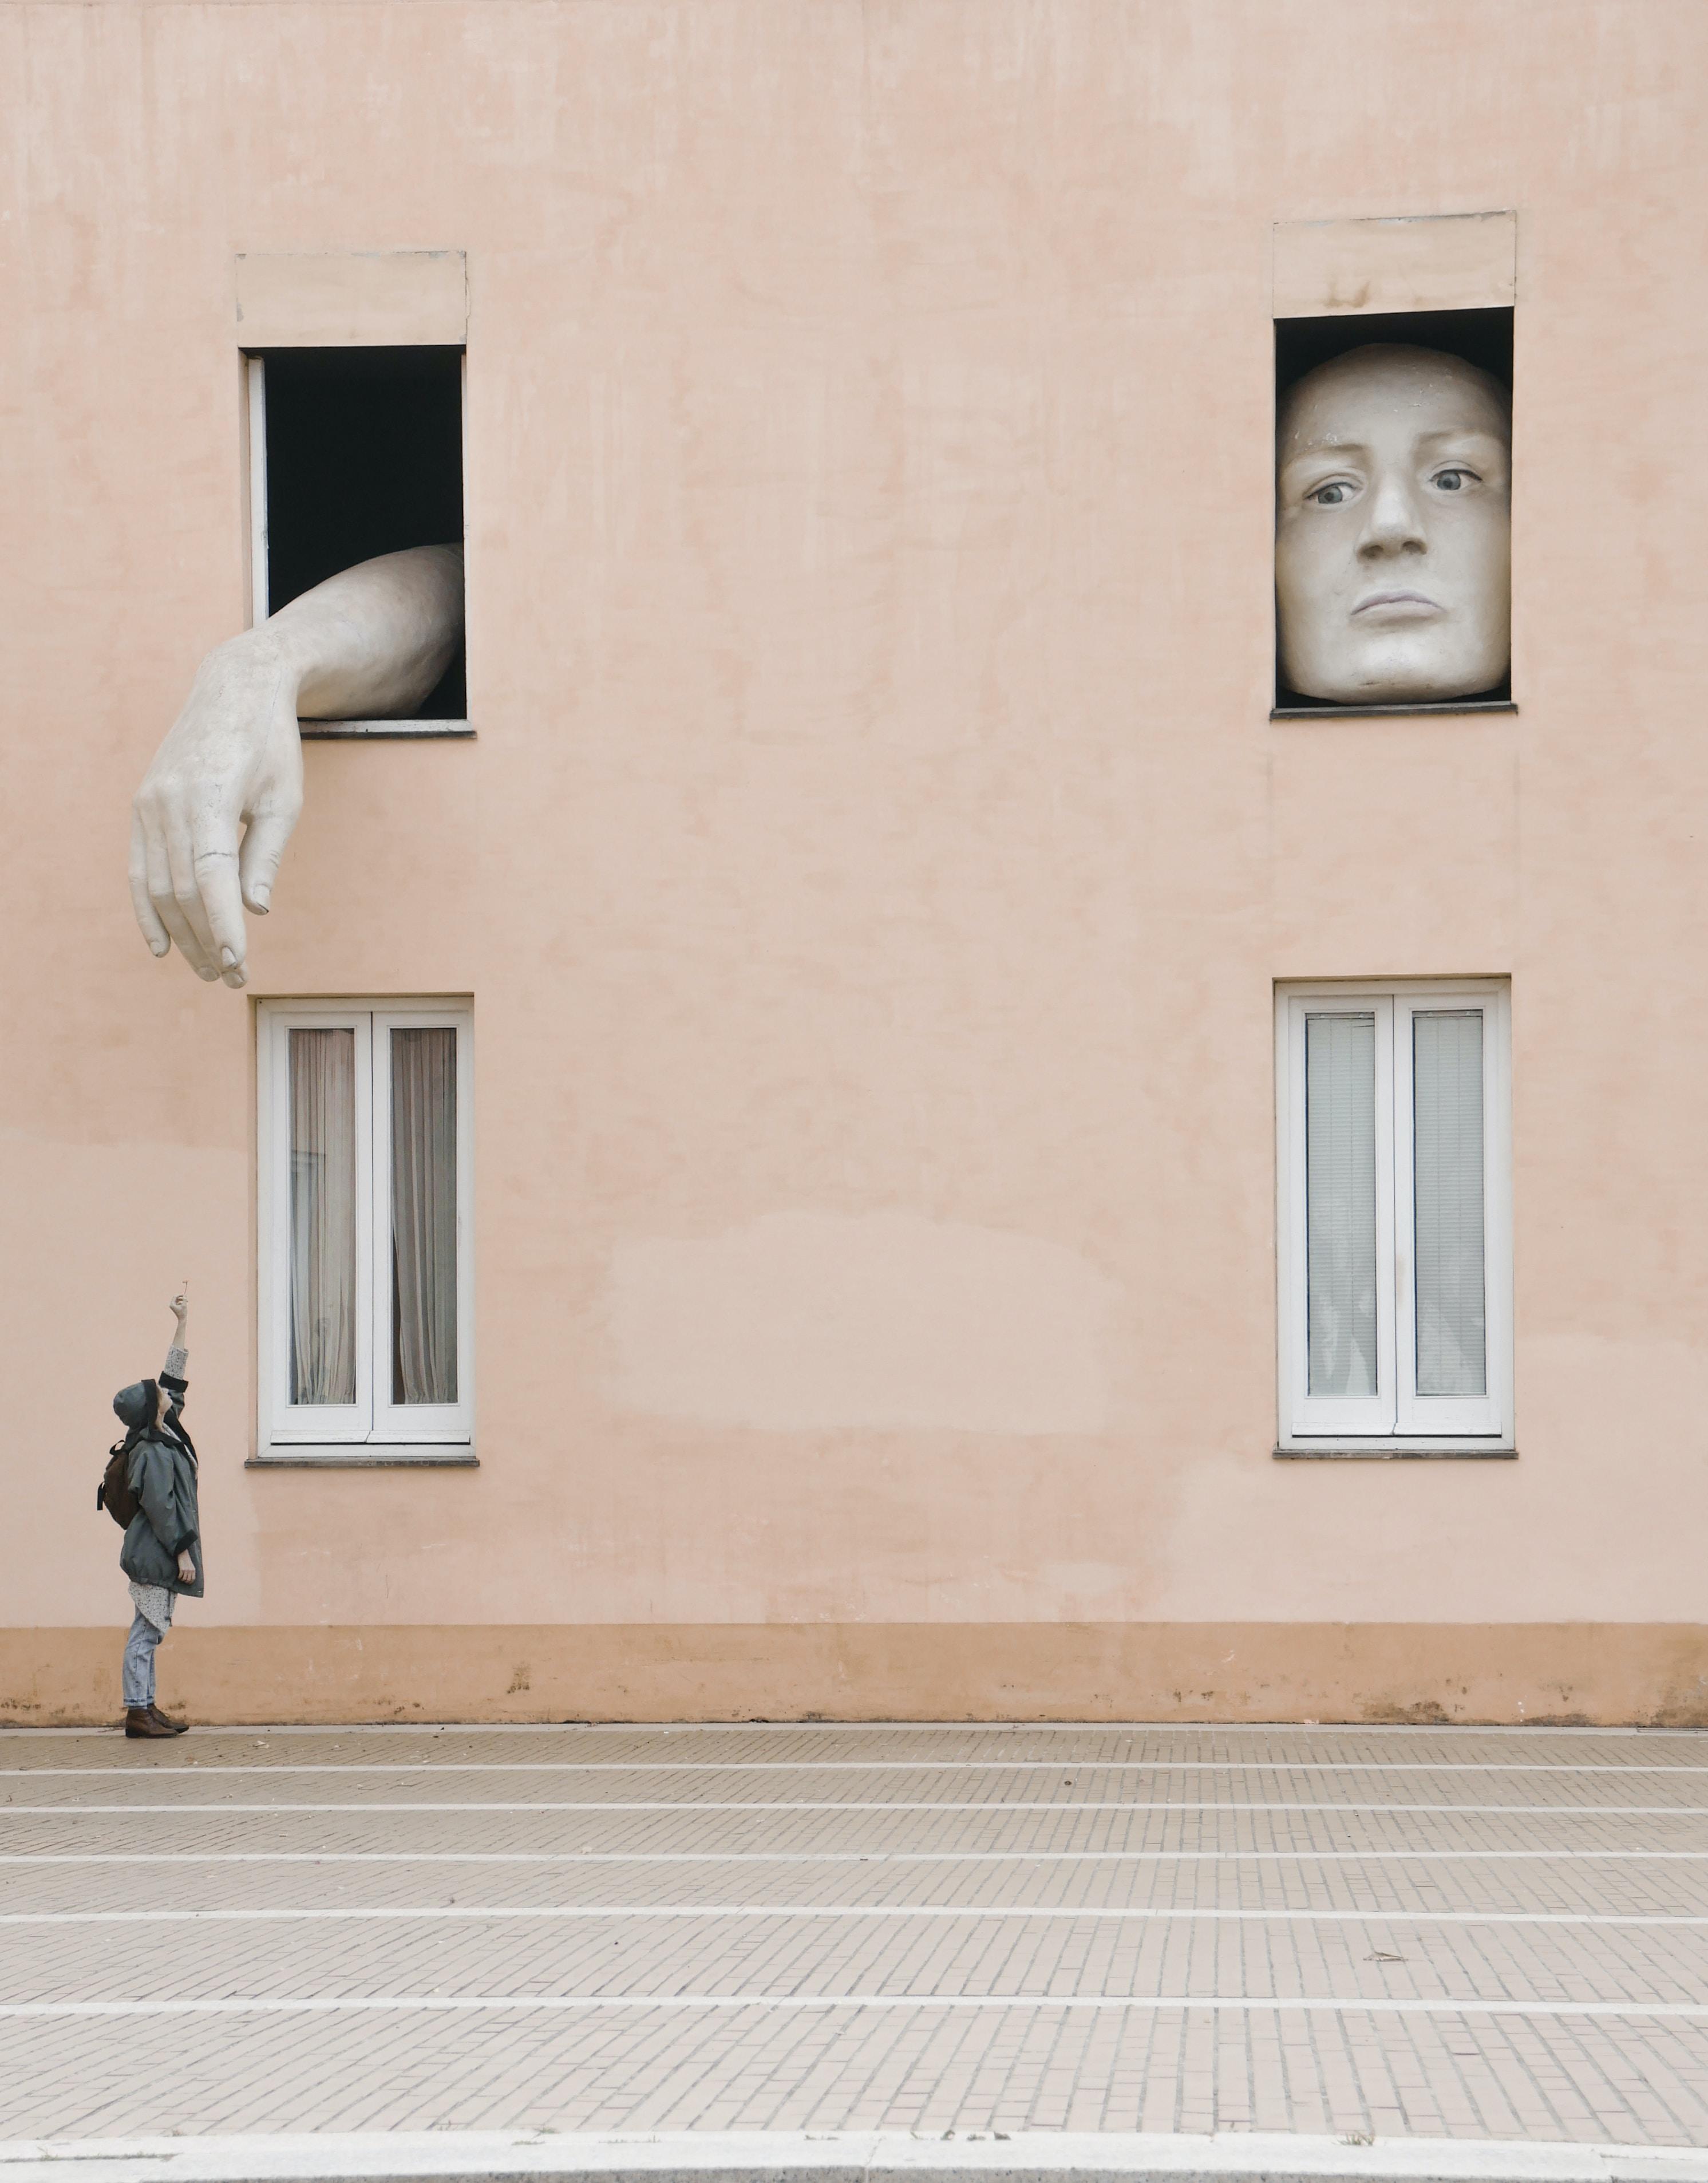 person raising hand under the window